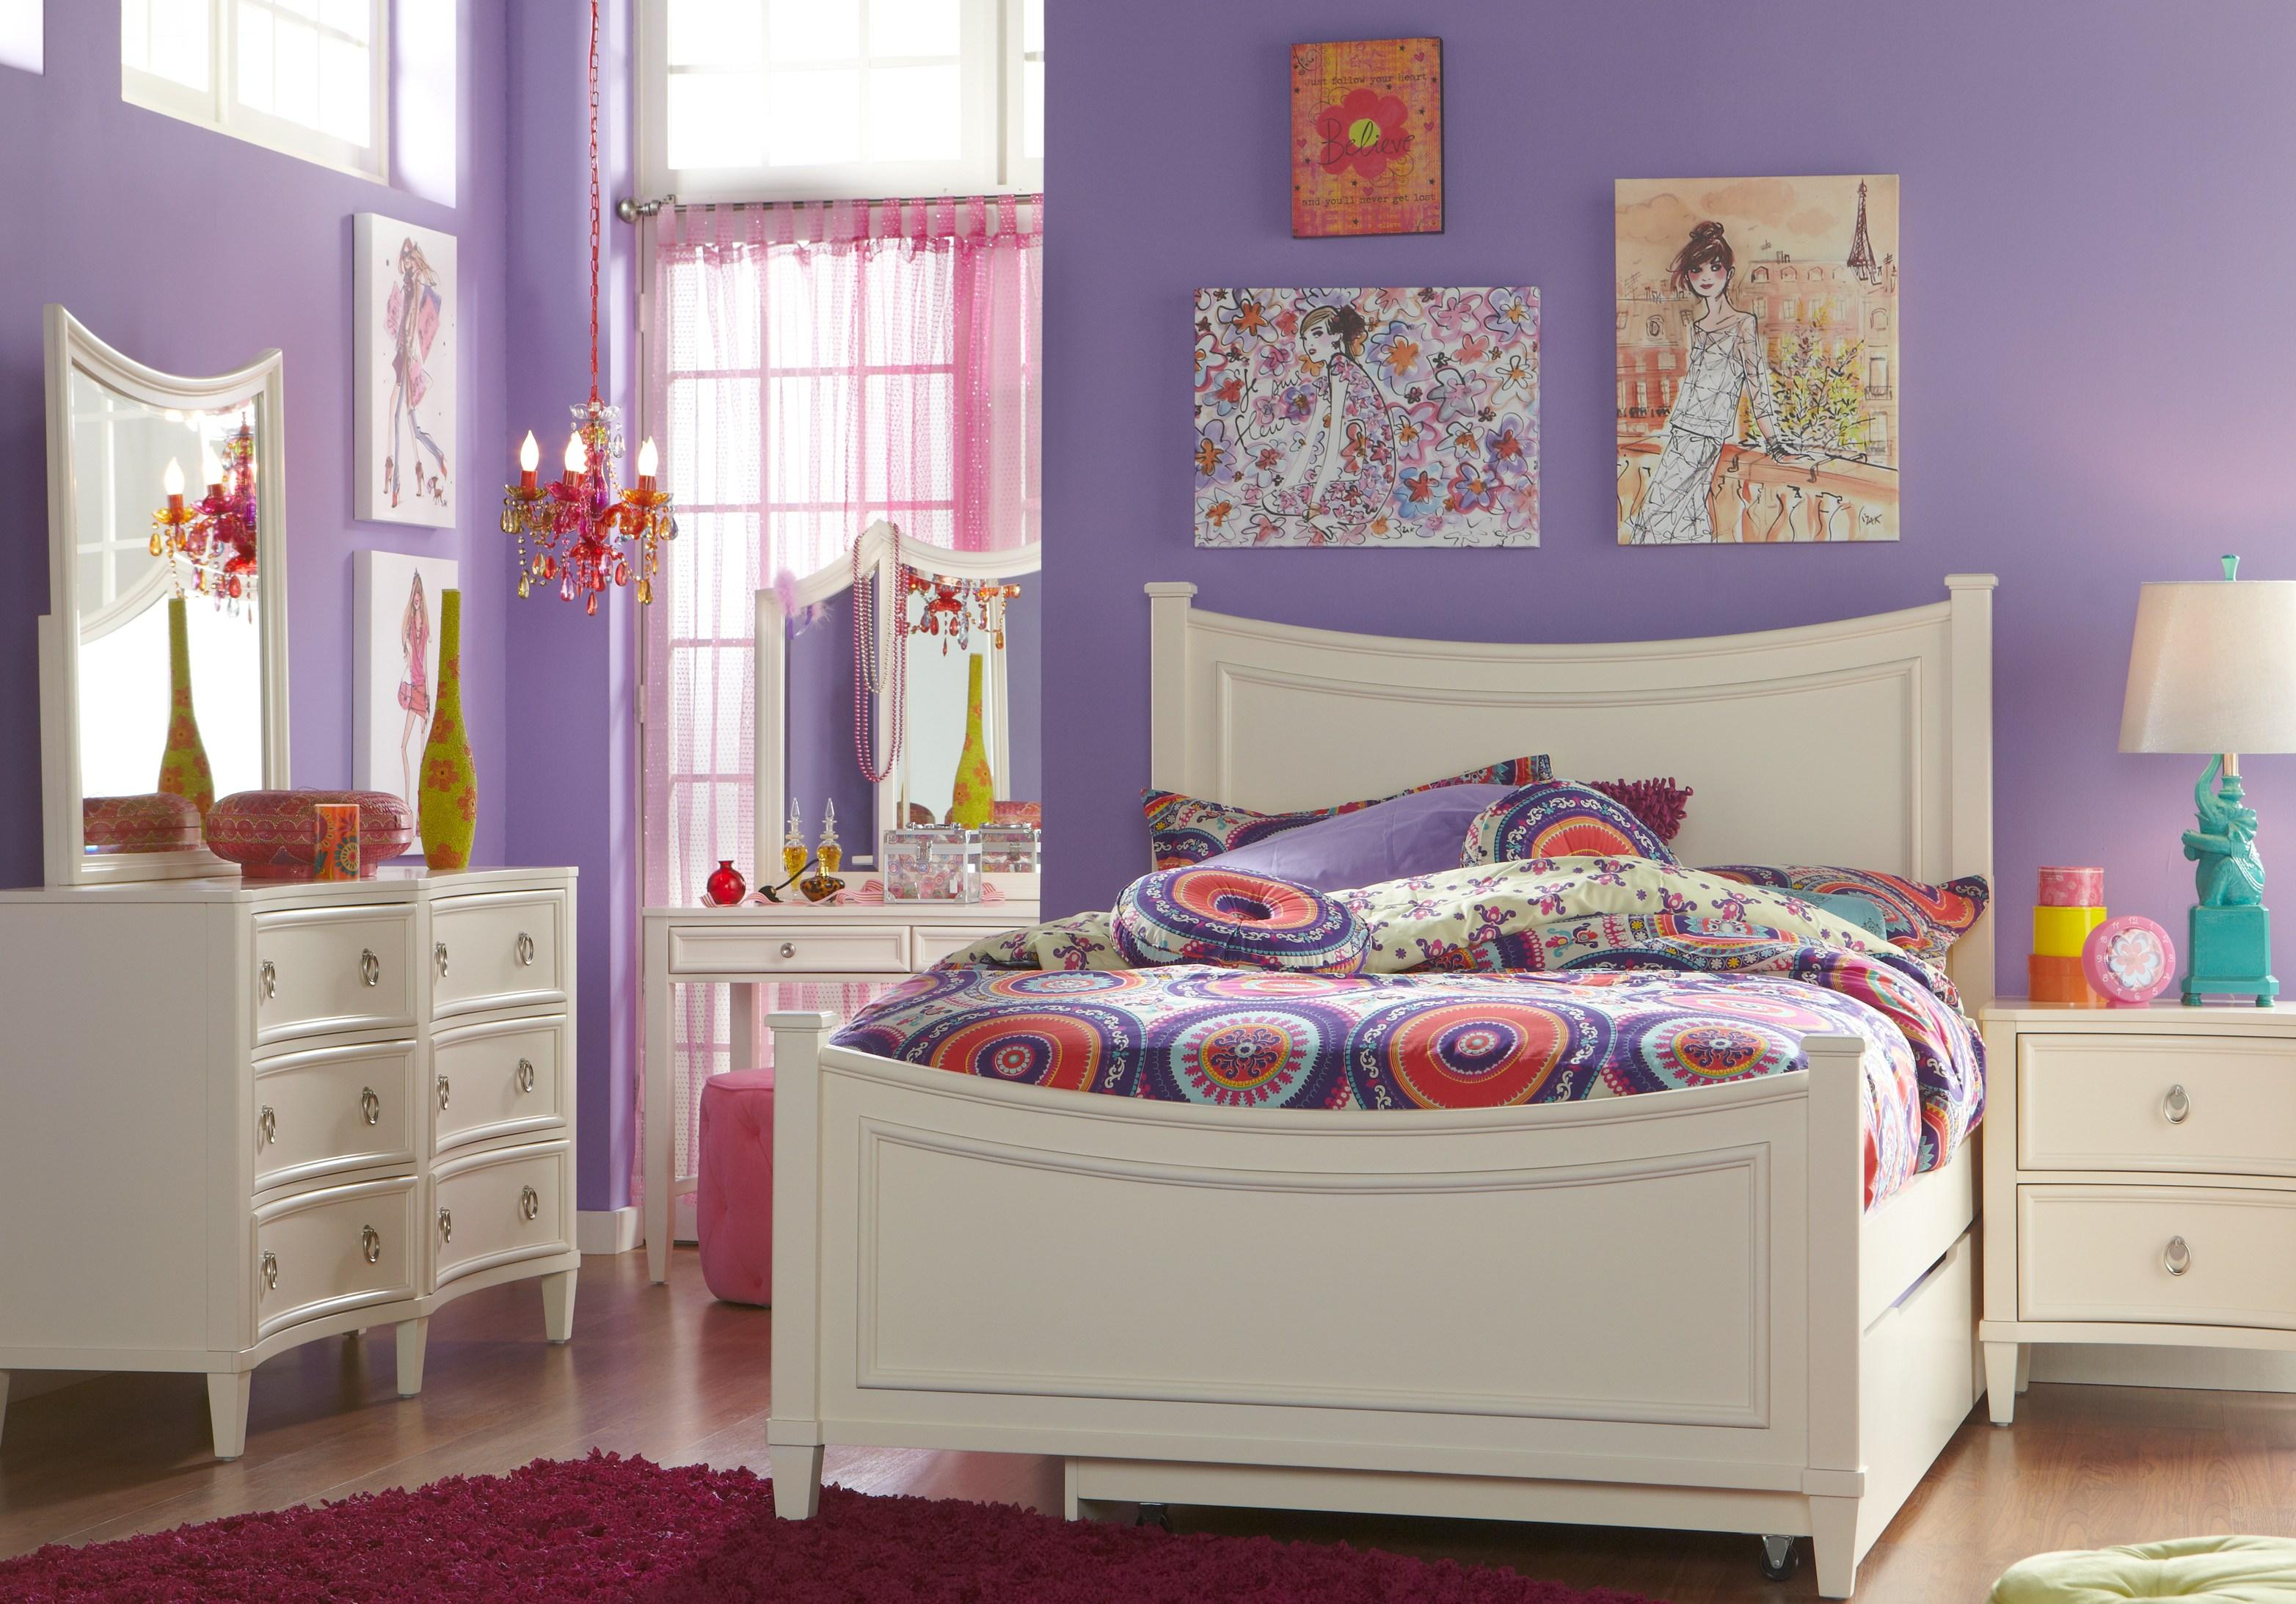 Full Size Teenage Bedroom Sets: 4, 5 & 6 piece Suites